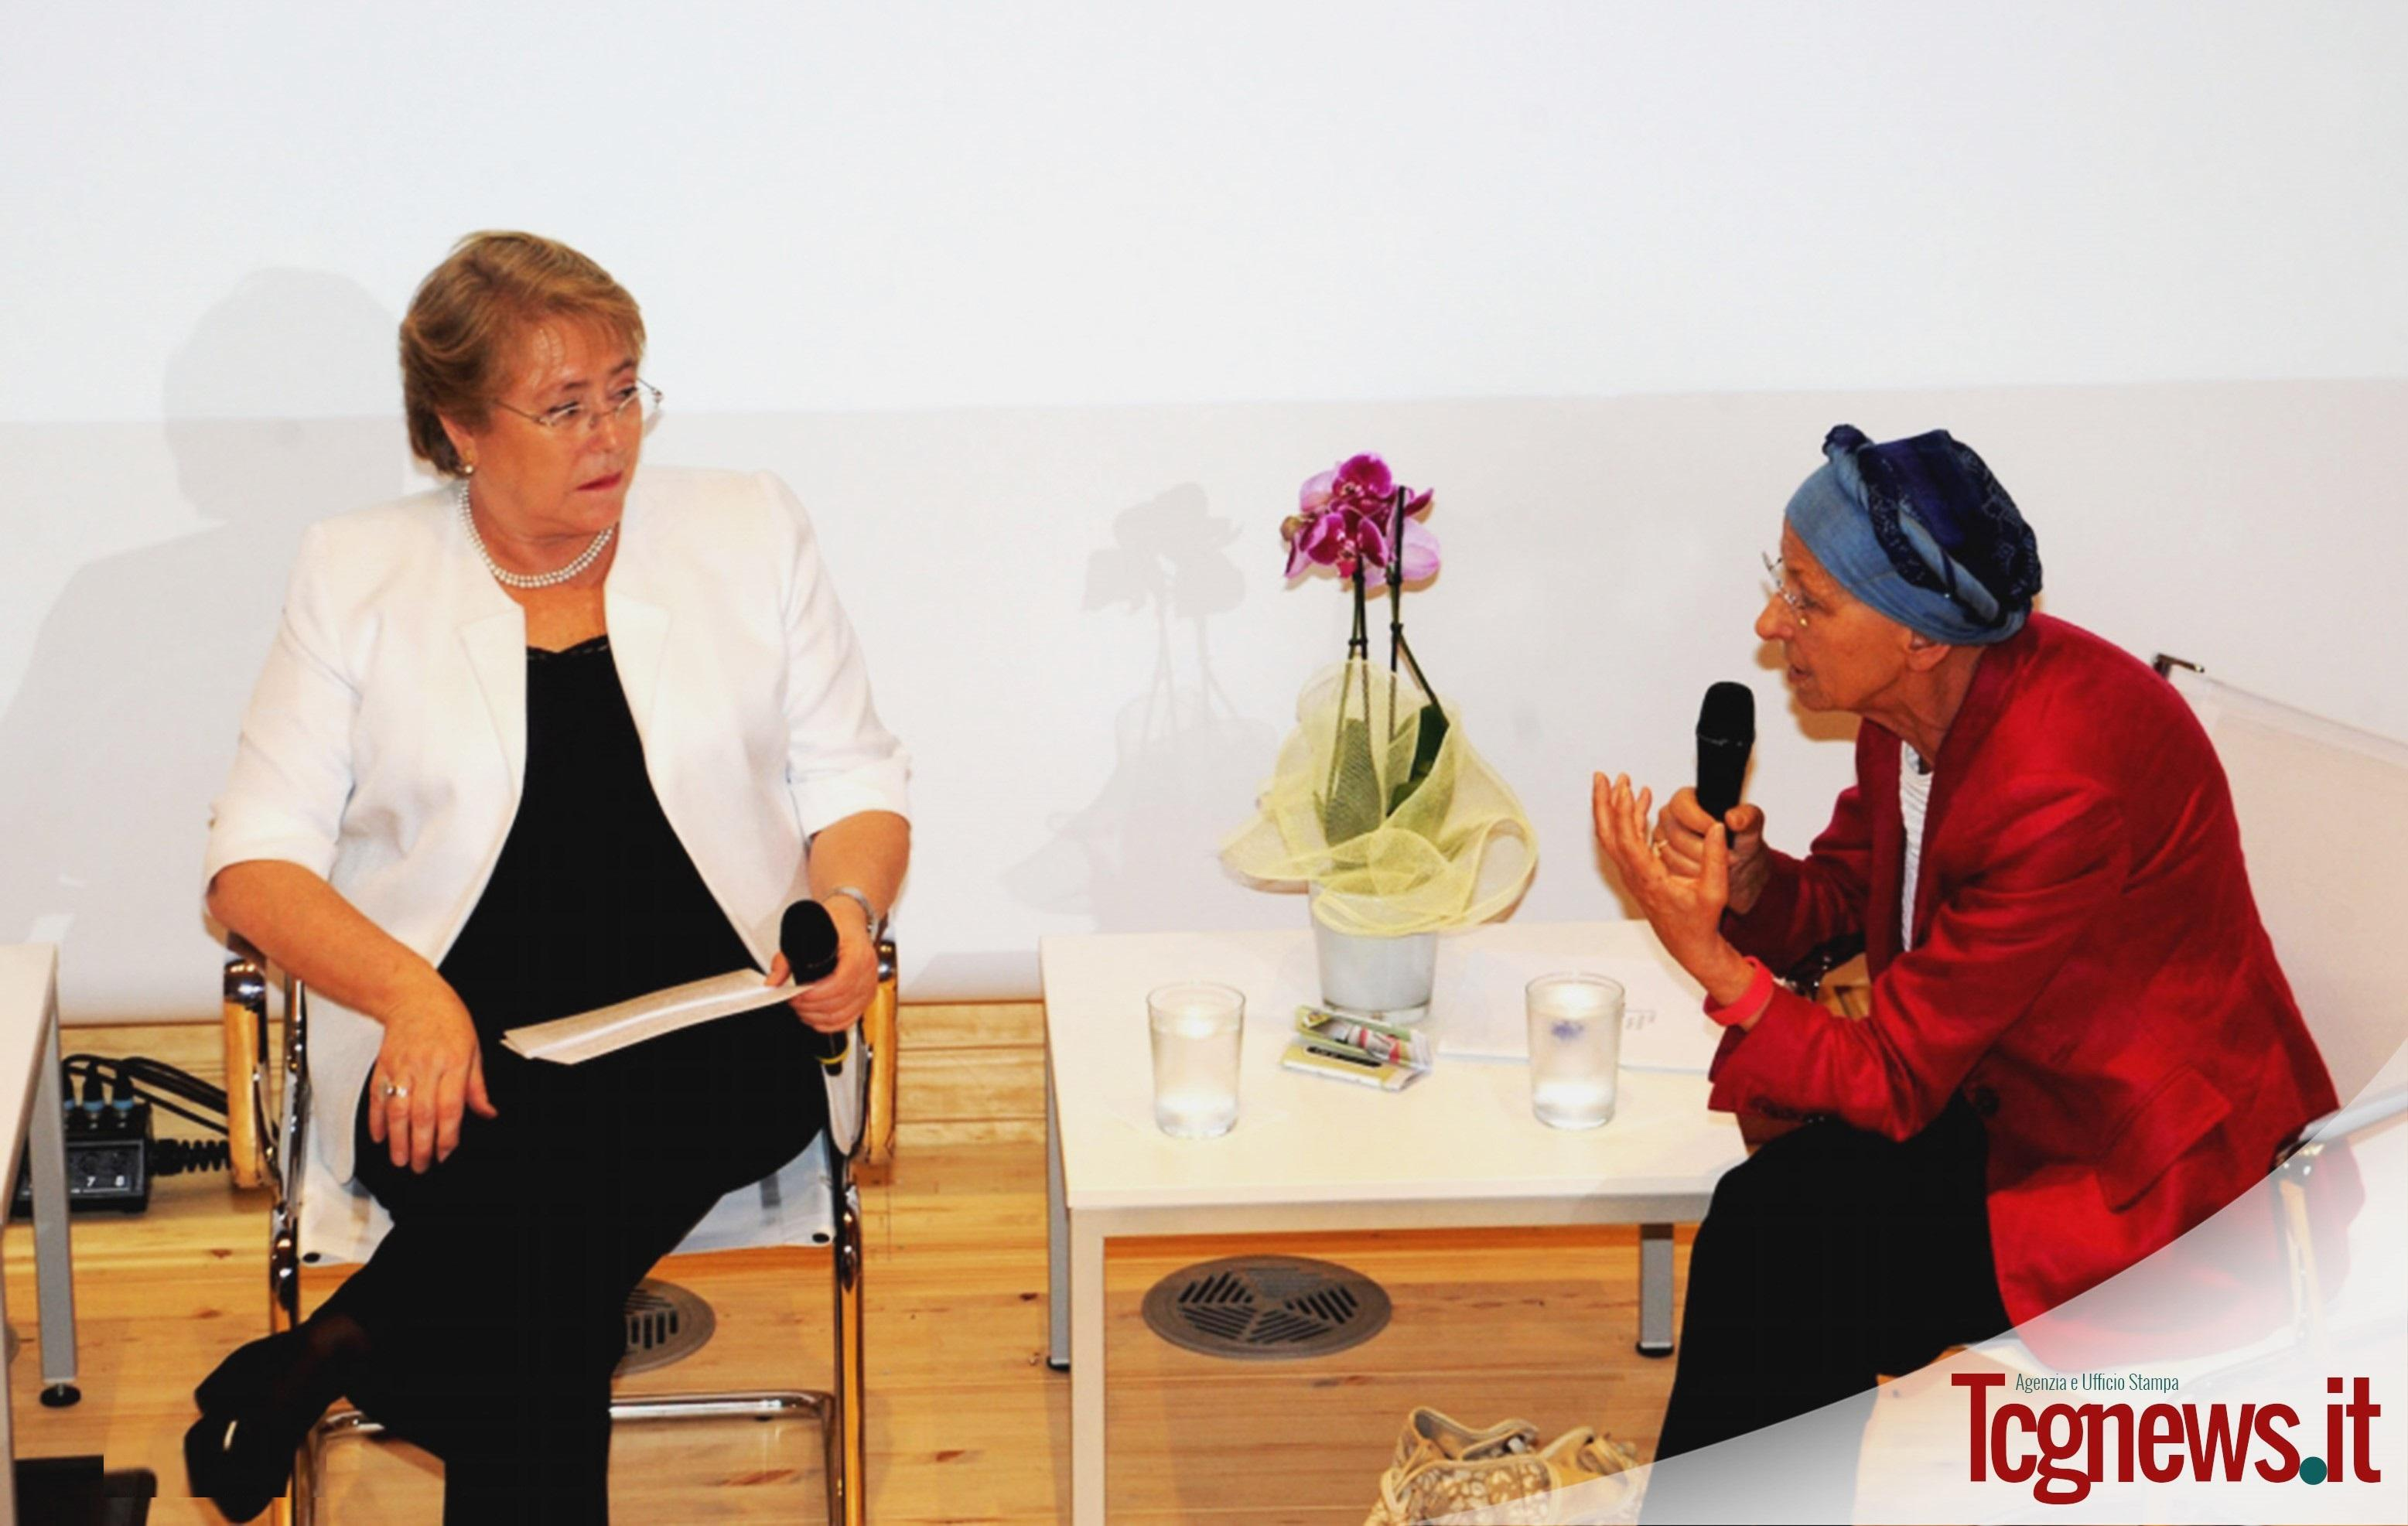 A Expo 2015 la Women for Expo Alliance con Michelle Bachelet e Emma Bonino